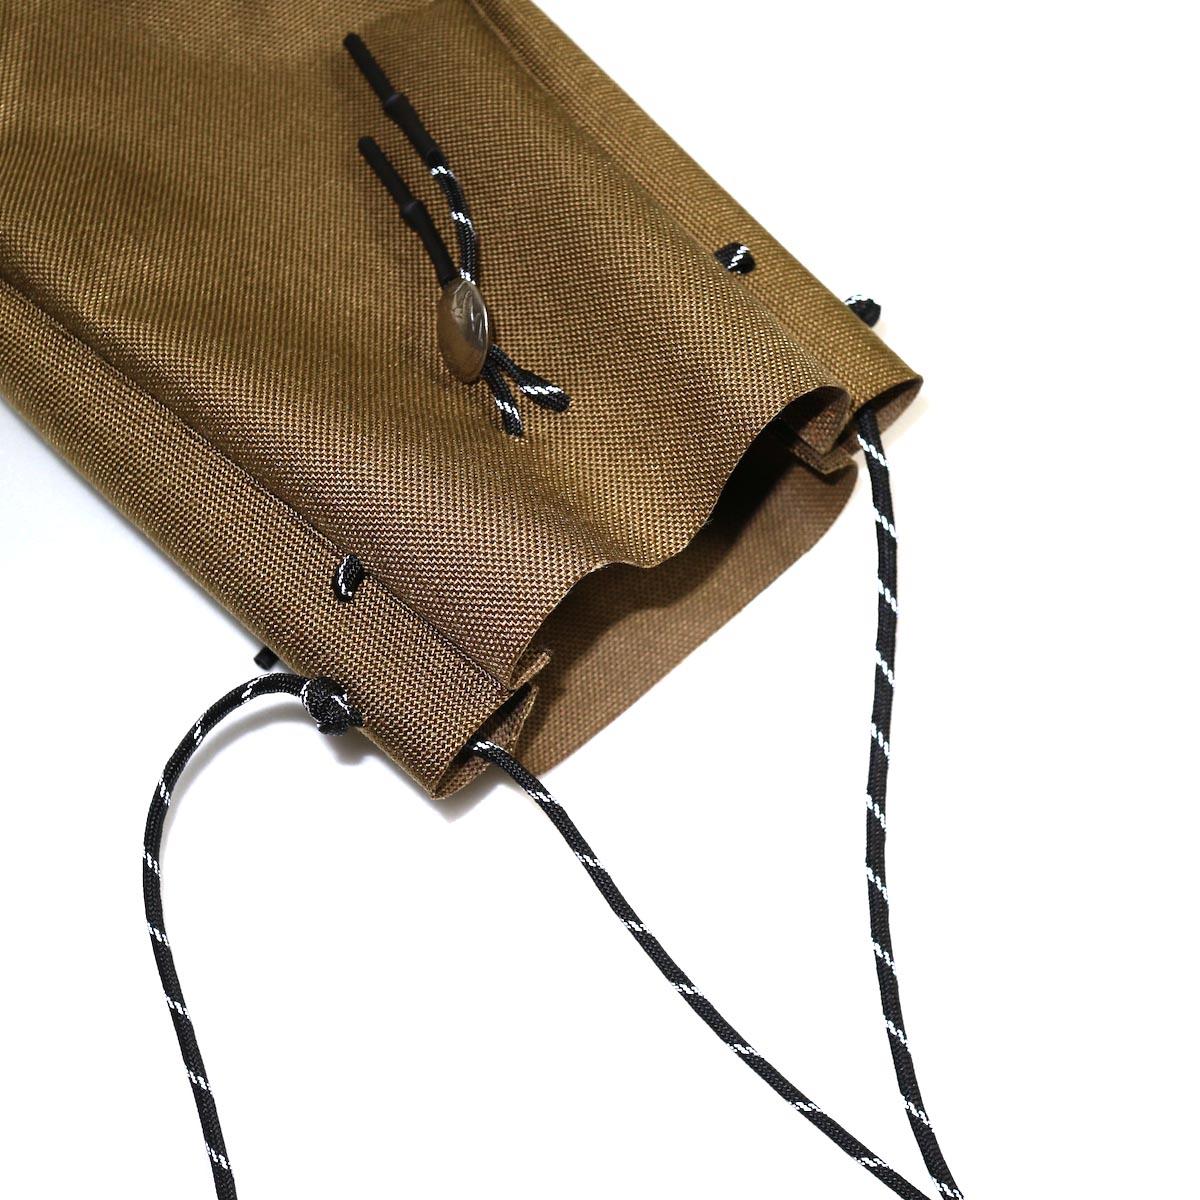 吉岡衣料店 / drawstring bag -L-. black 開口部イメージ